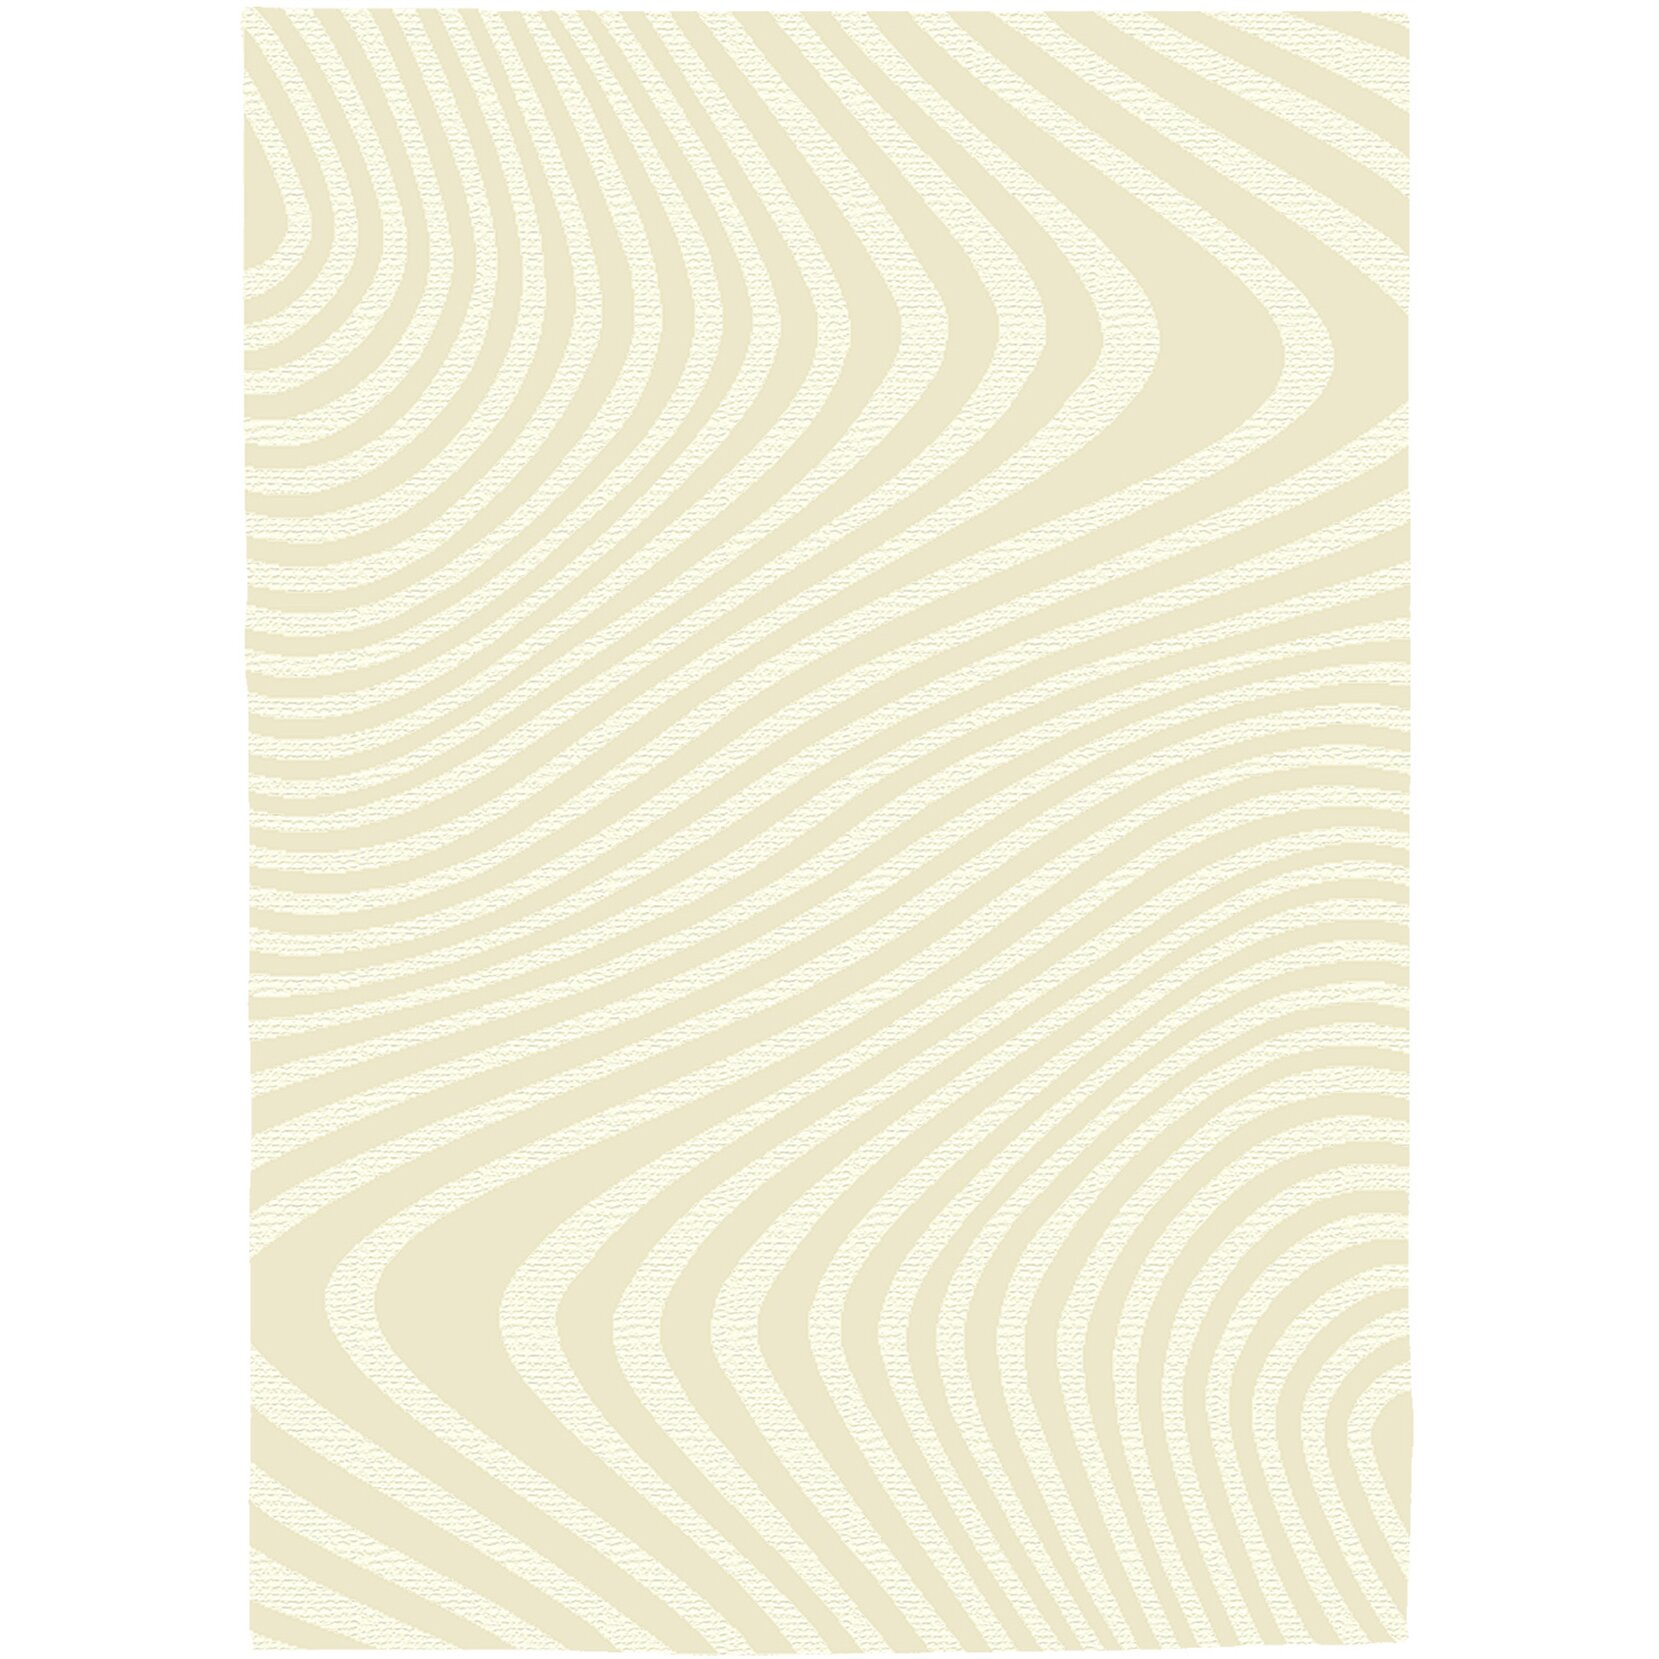 Balta rochester cream area rug wayfair for 10x10 area rug